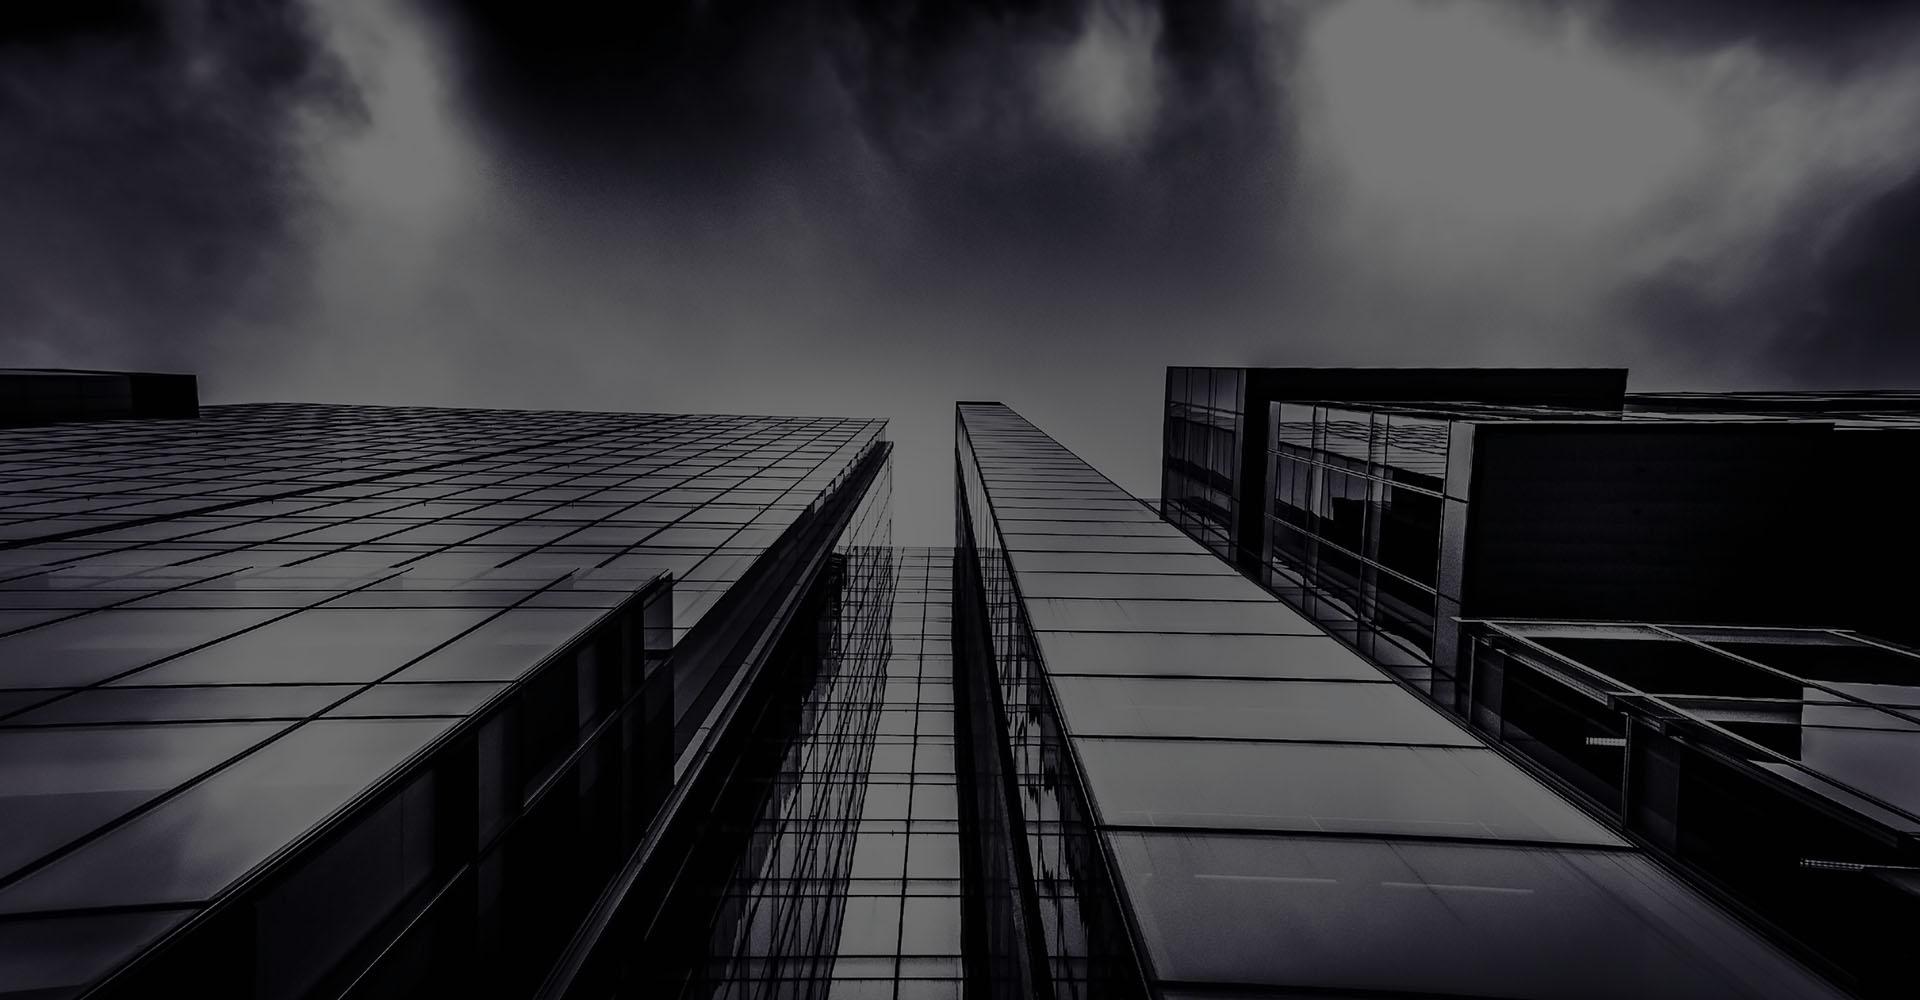 Building skyscraper looking up vertically